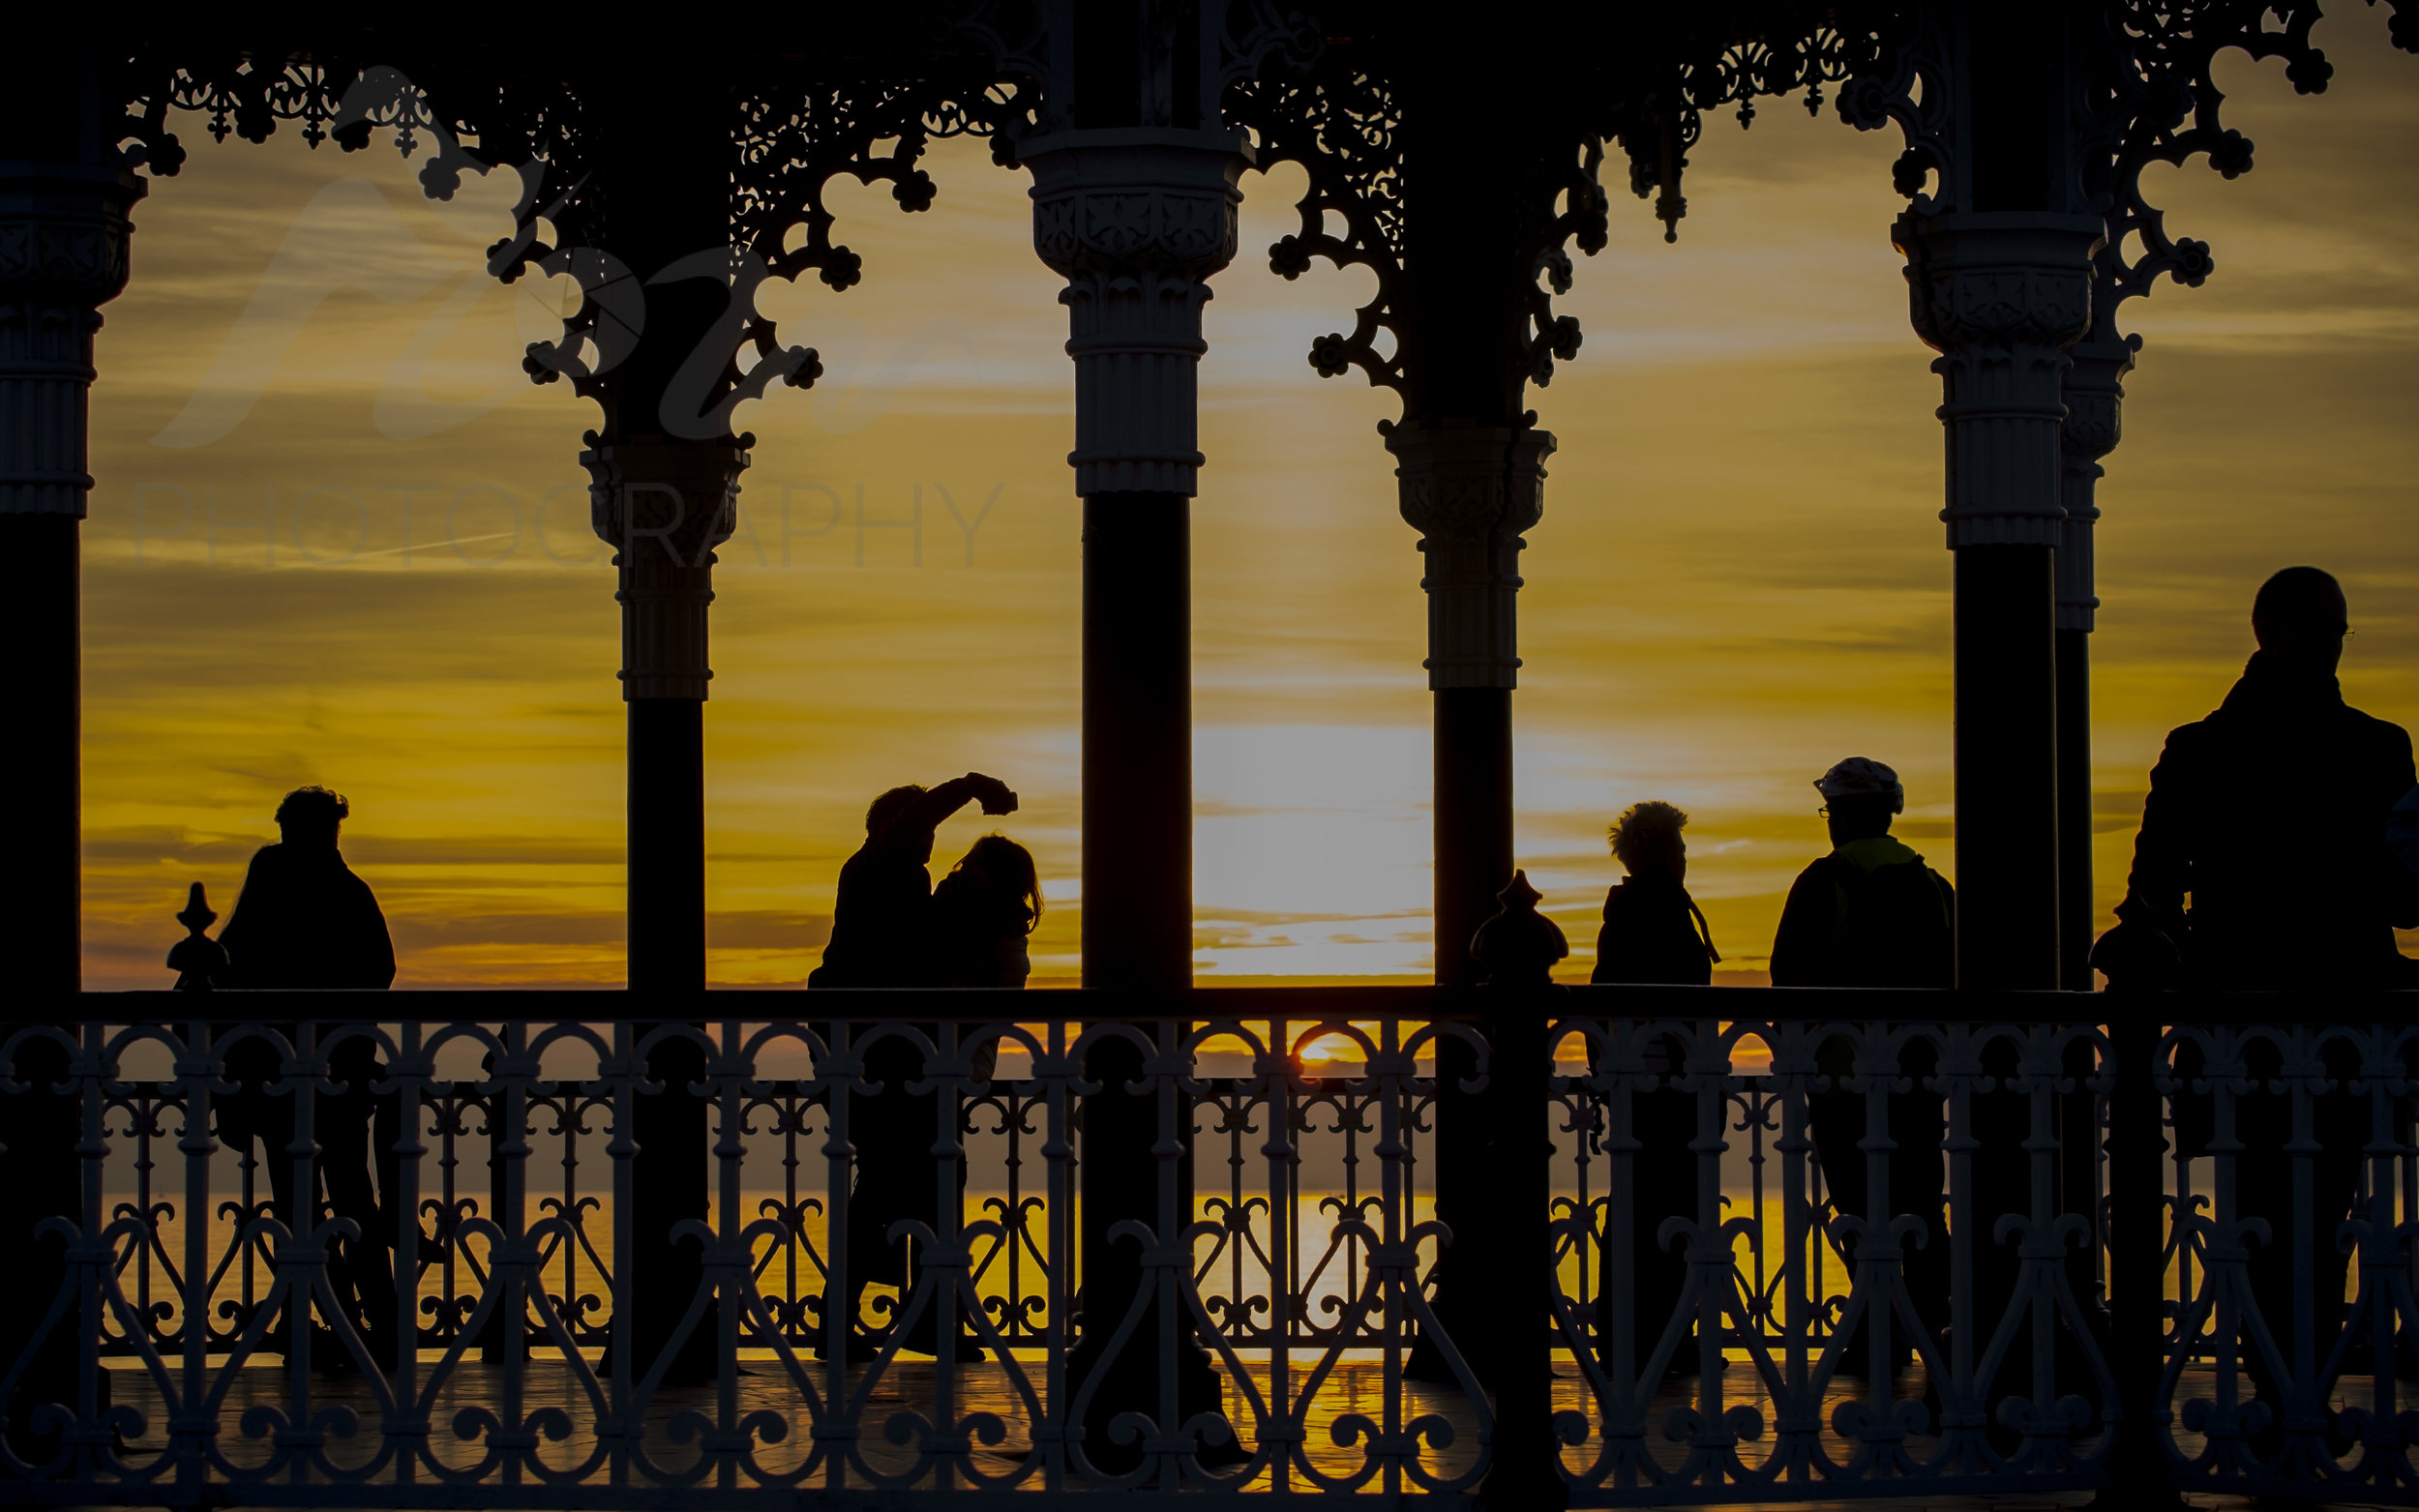 Sunset Selfies